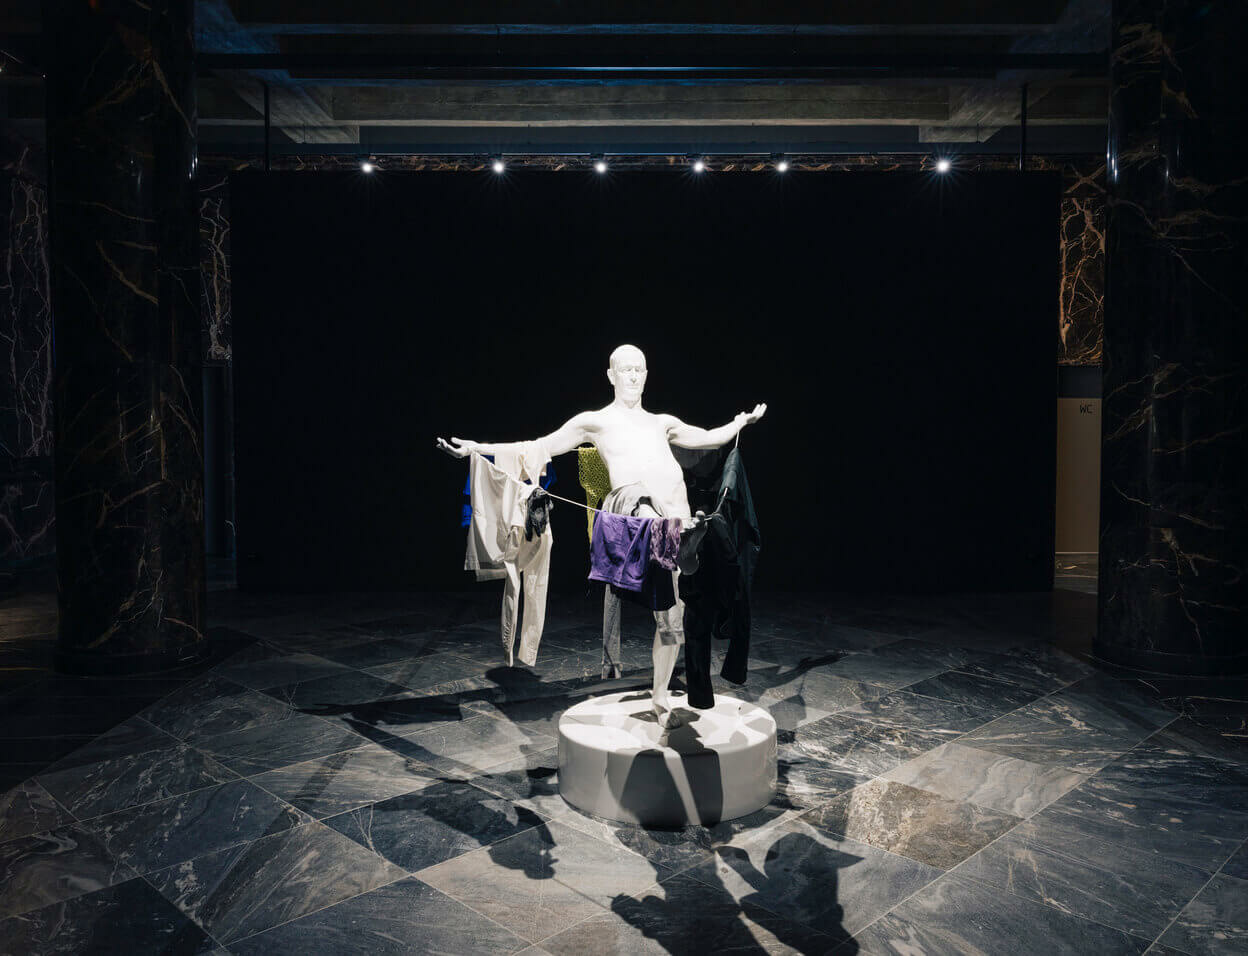 Christian Jankowski's solo exhibition 'Sender and Receiver' at Fluentum, Berlin